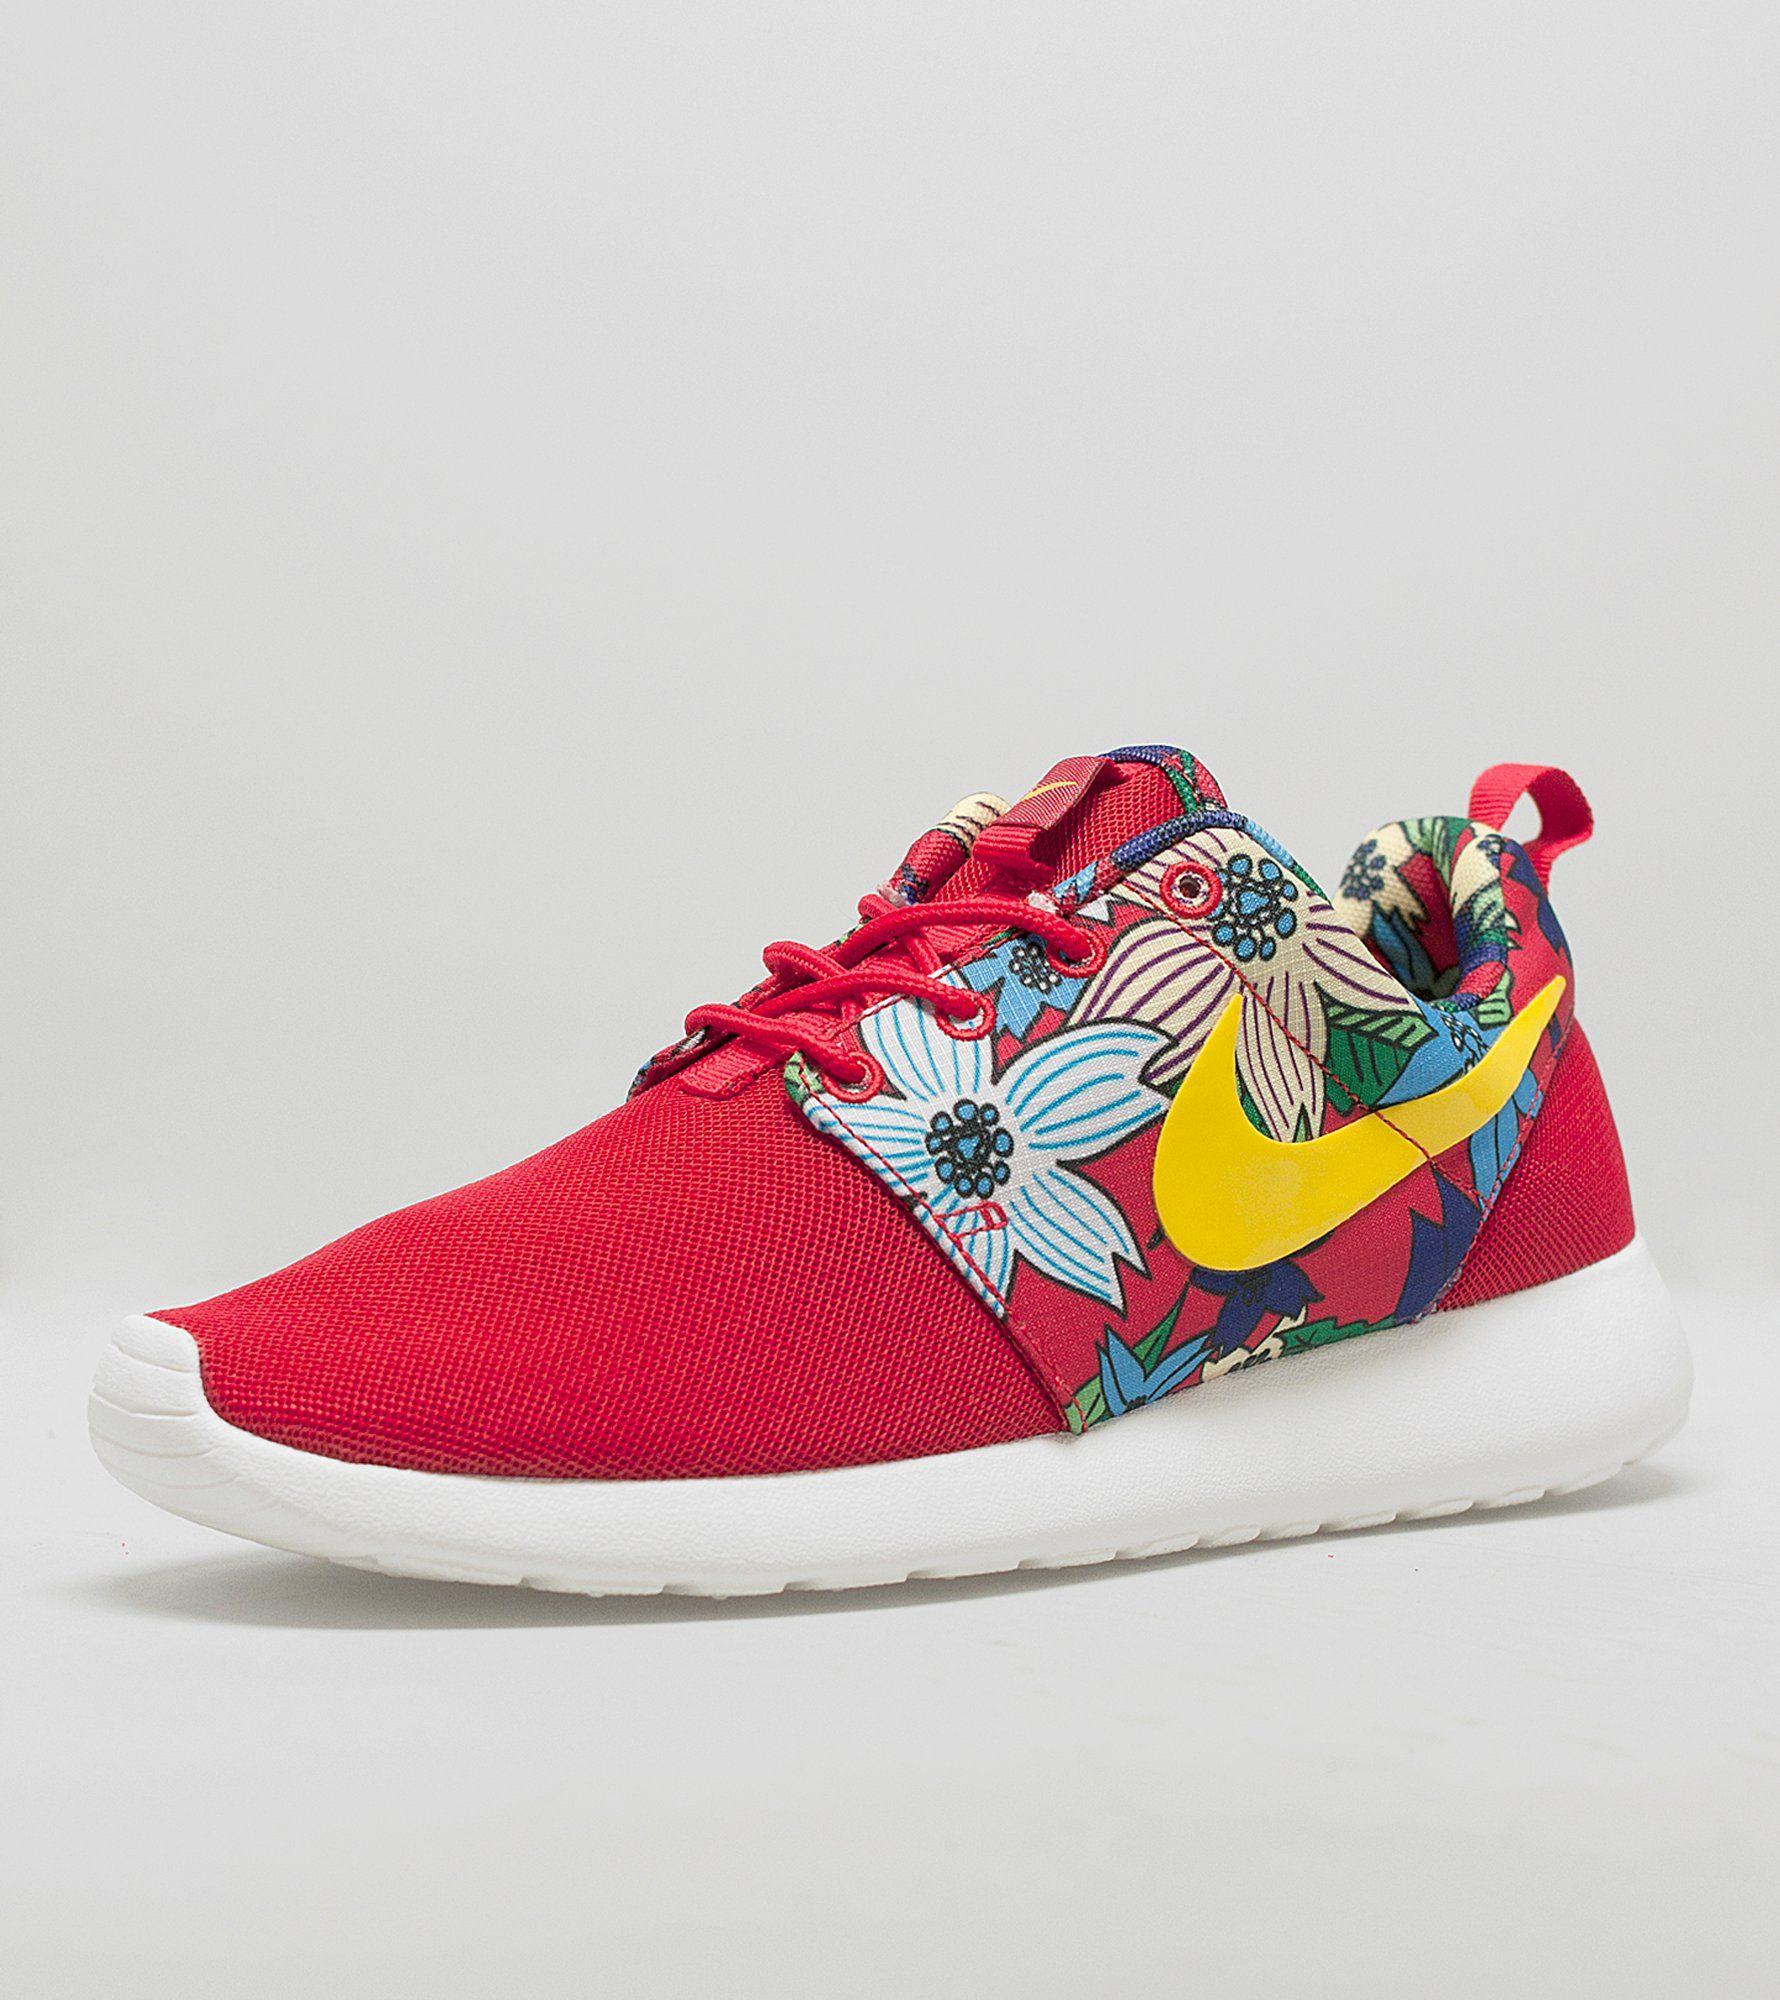 online store 2fb03 7b07c Nike Roshe One Aloha Pack  Size